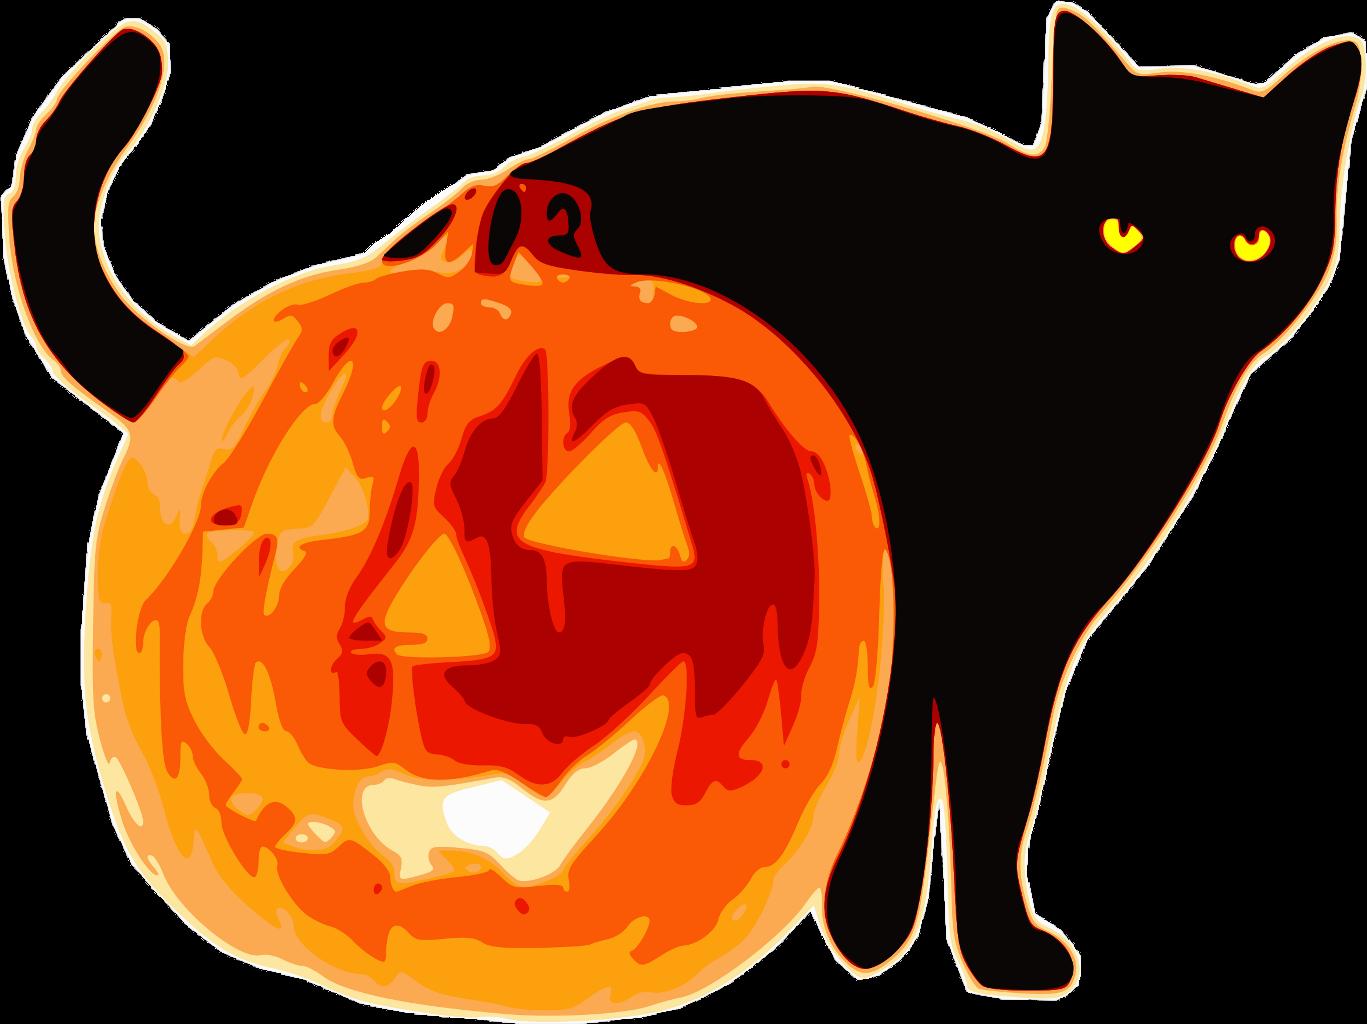 jackolantern lantern pumpkin jack halloween creepy face... picture transparent stock